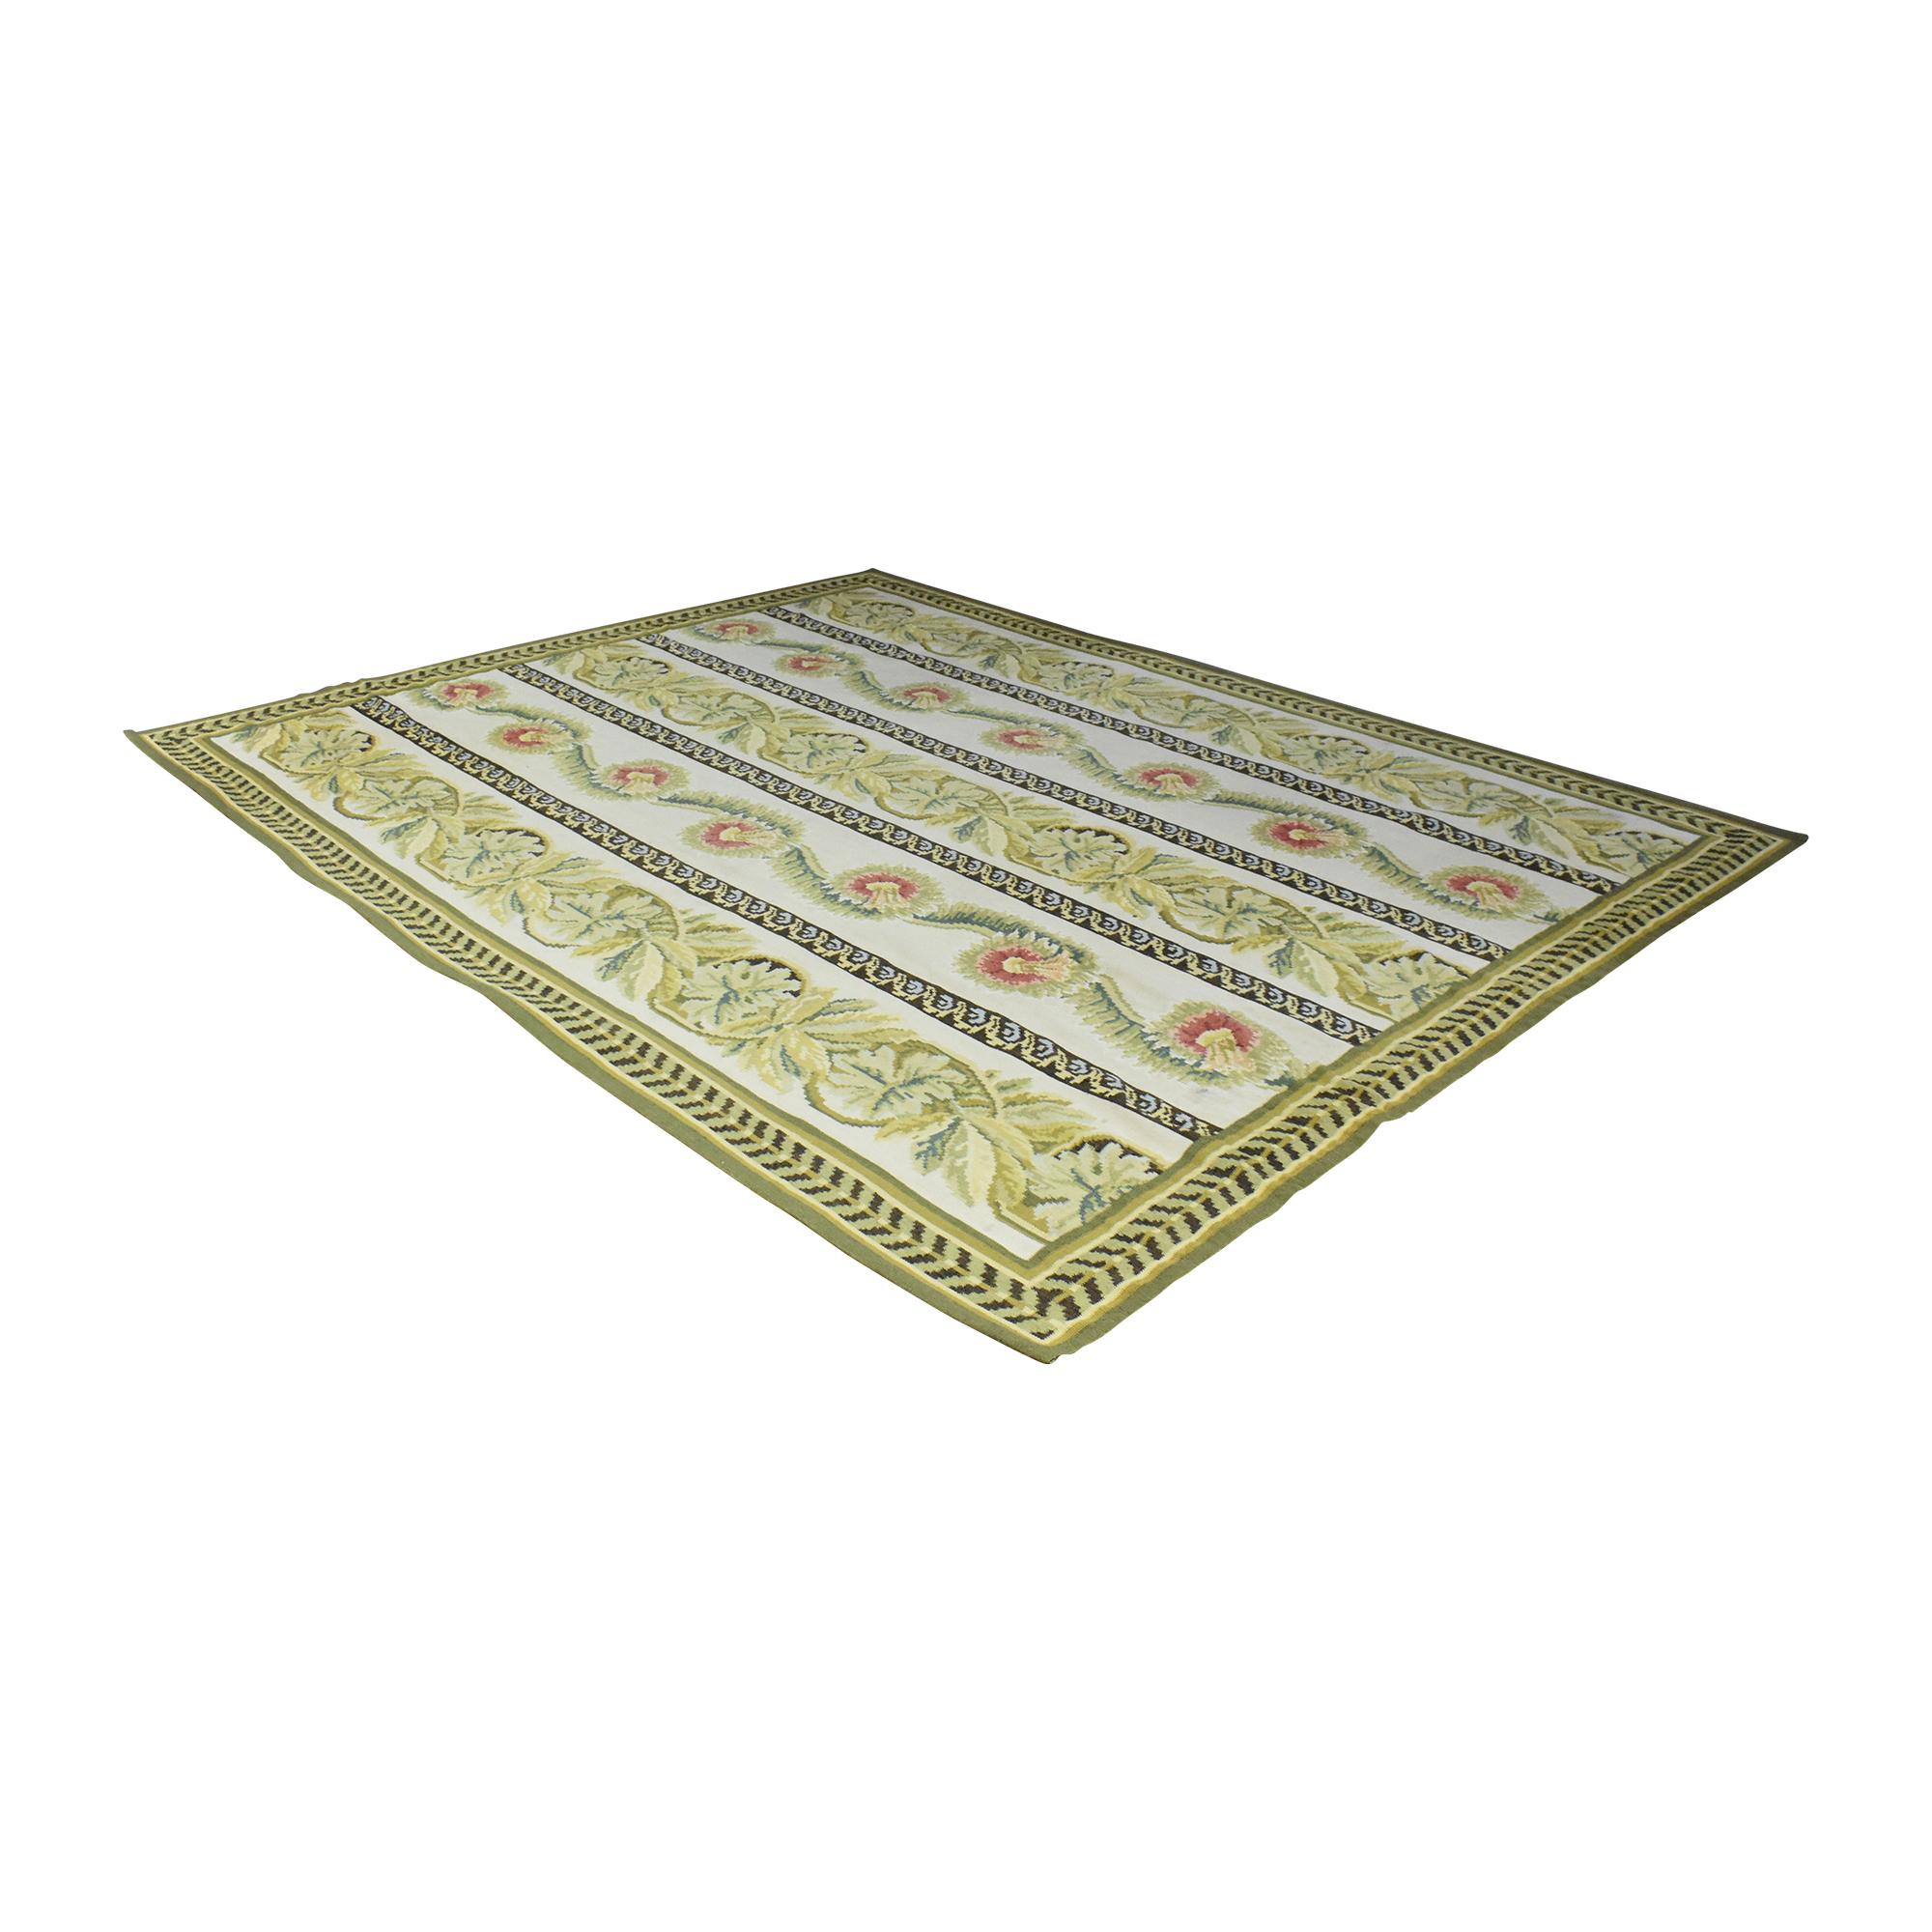 Stark Carpet Patterned Area Rug / Decor